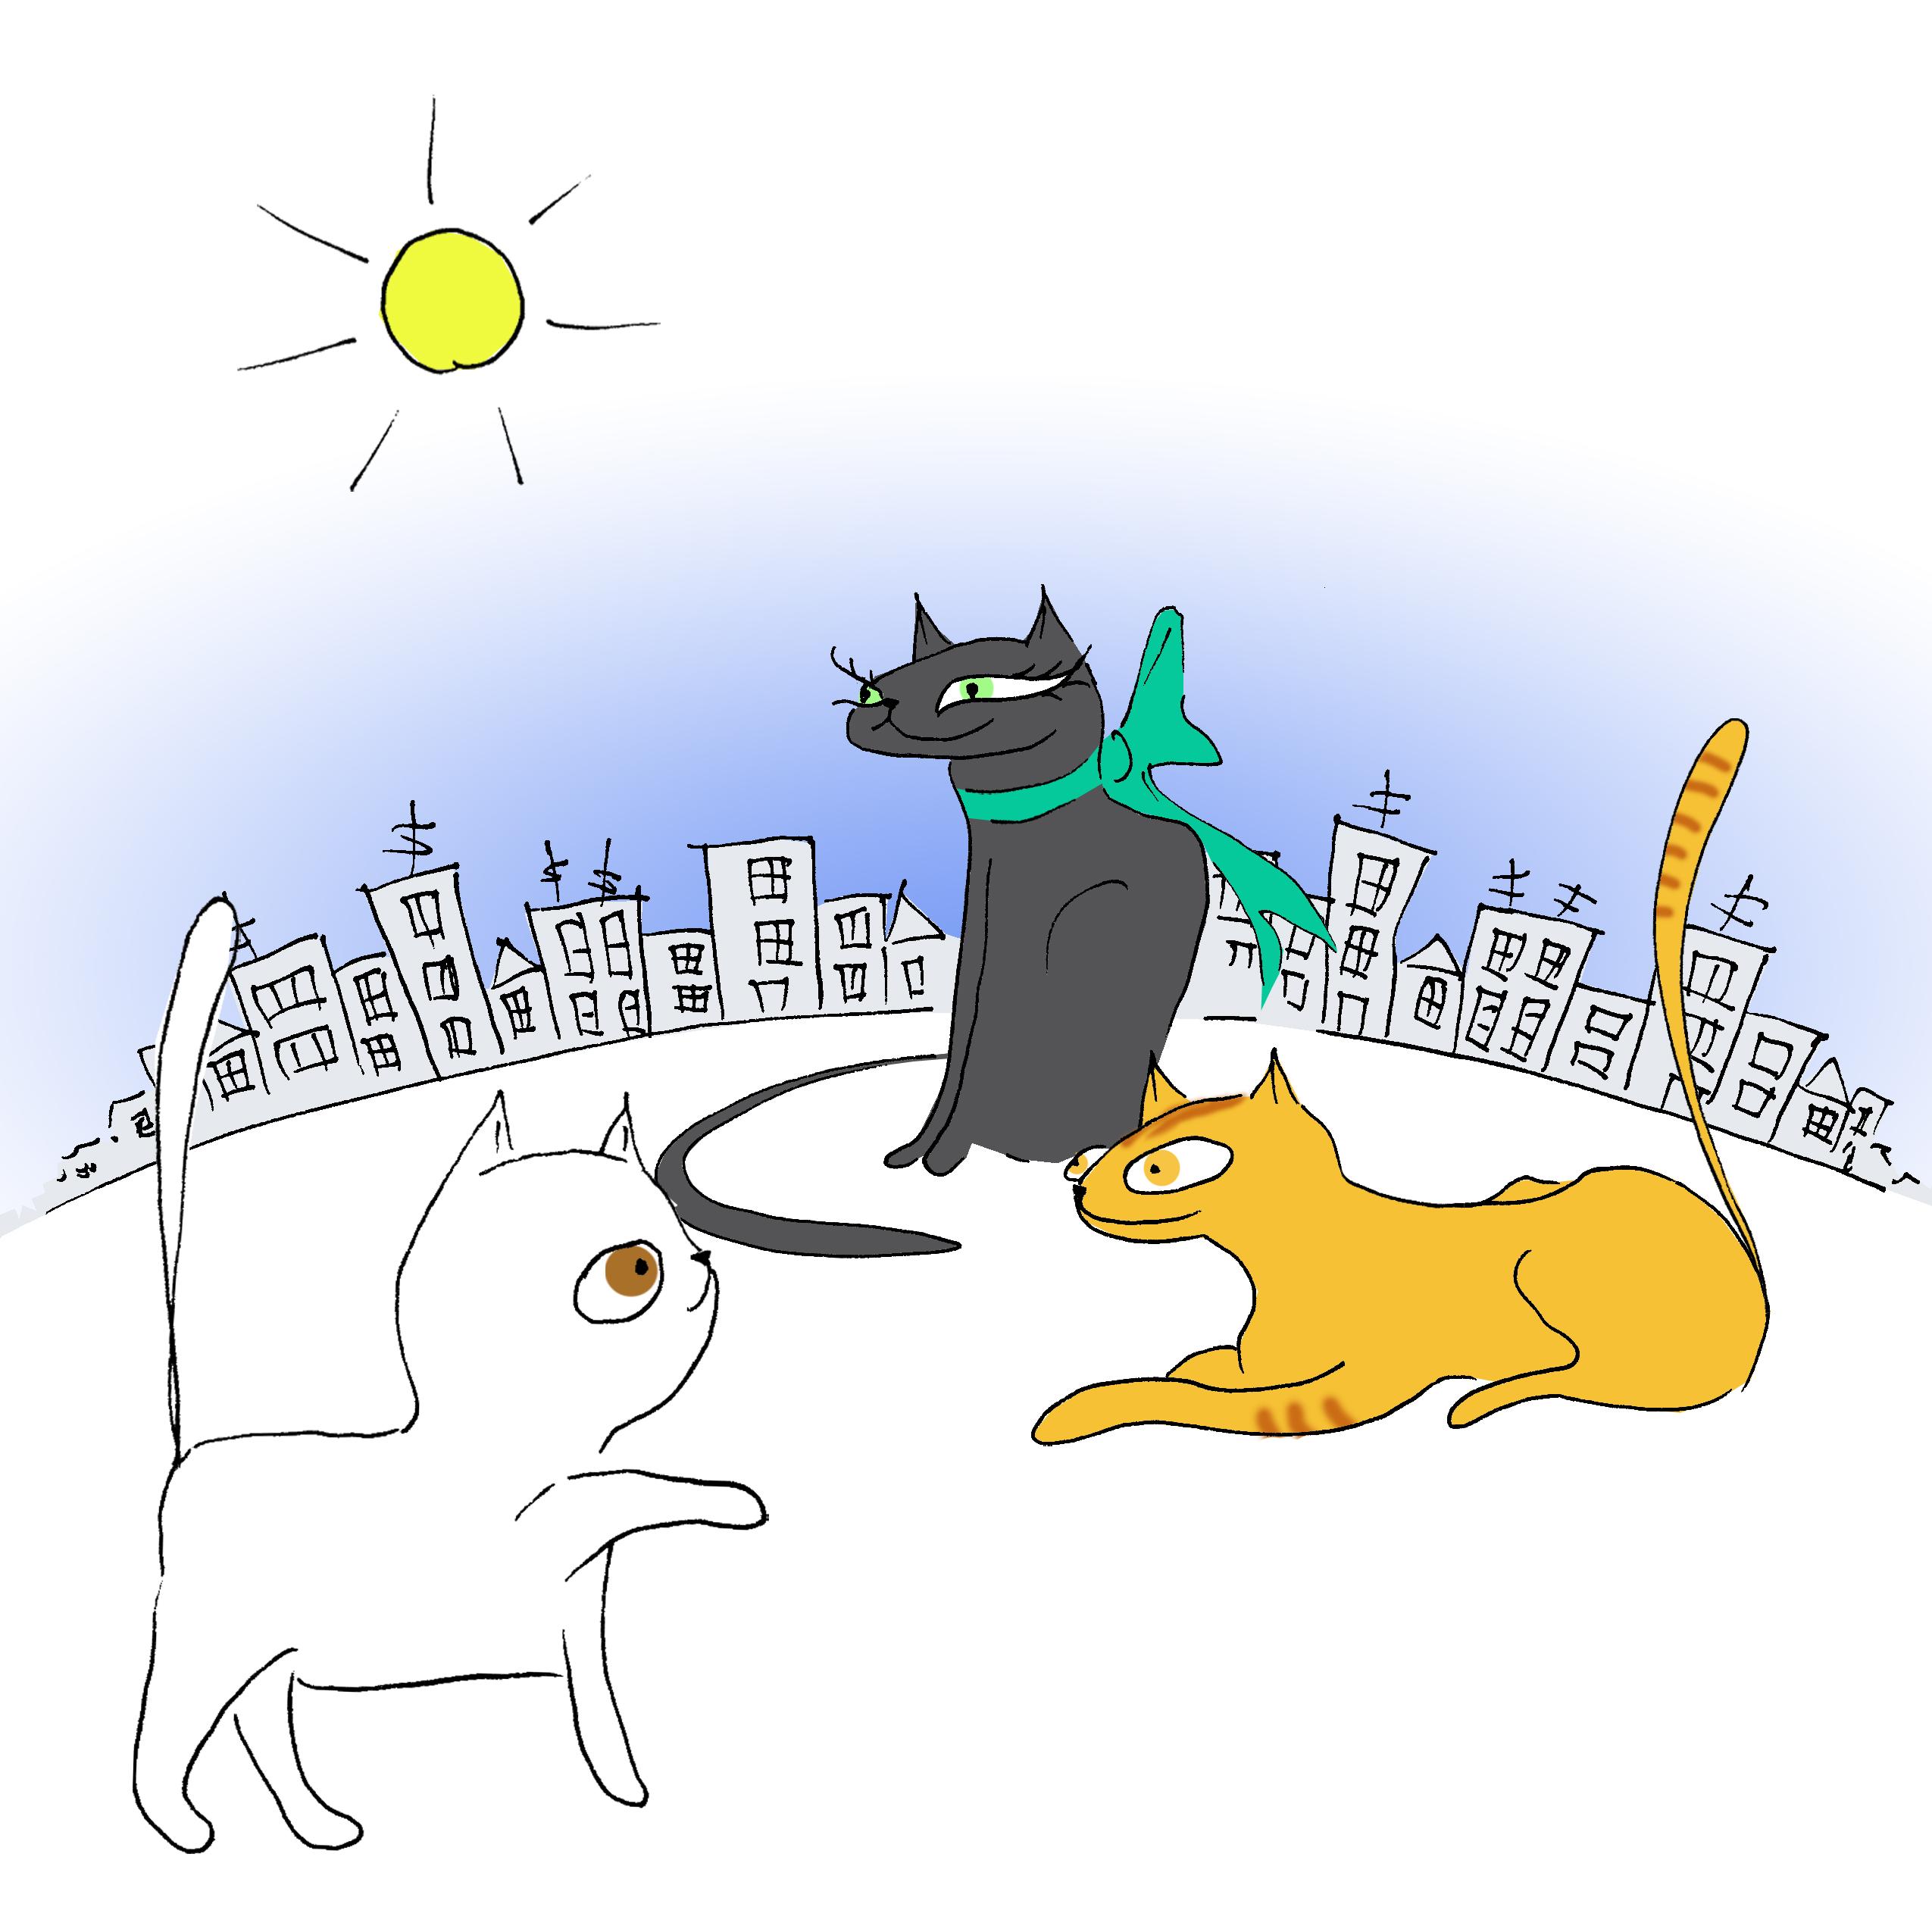 Мими&Китти – 16 – Мими хочет быть знаменитой by Irena Brodeski - Illustrated by Irena Brodeski - Ourboox.com